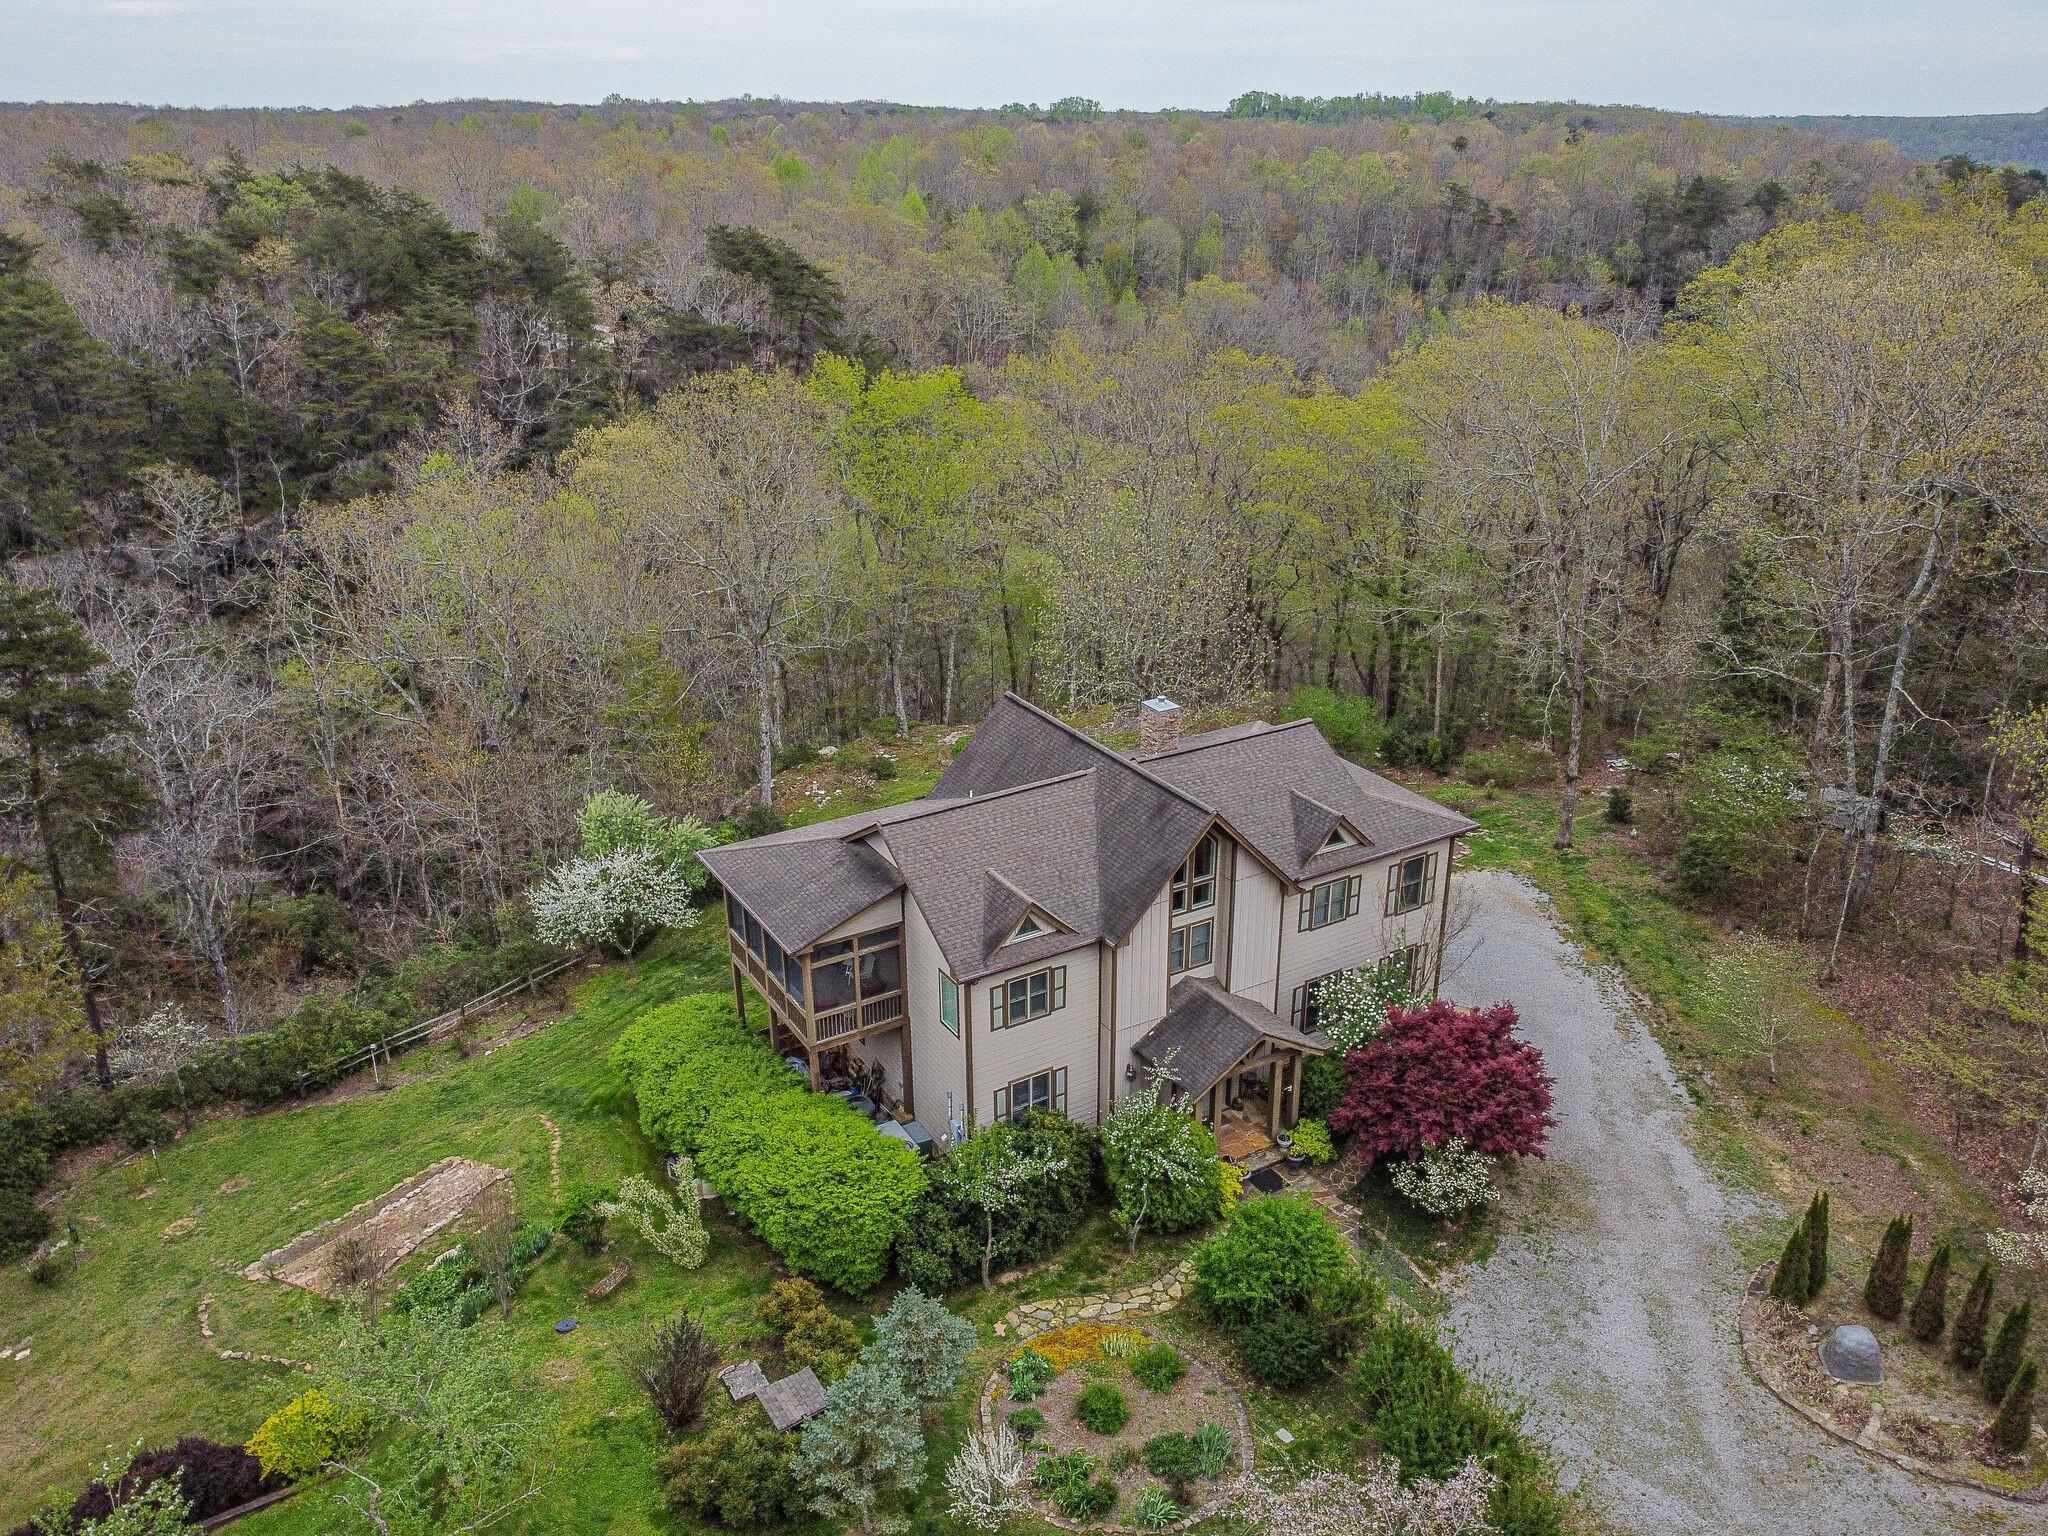 540 Monteagle Falls Rd Property Photo - Monteagle, TN real estate listing